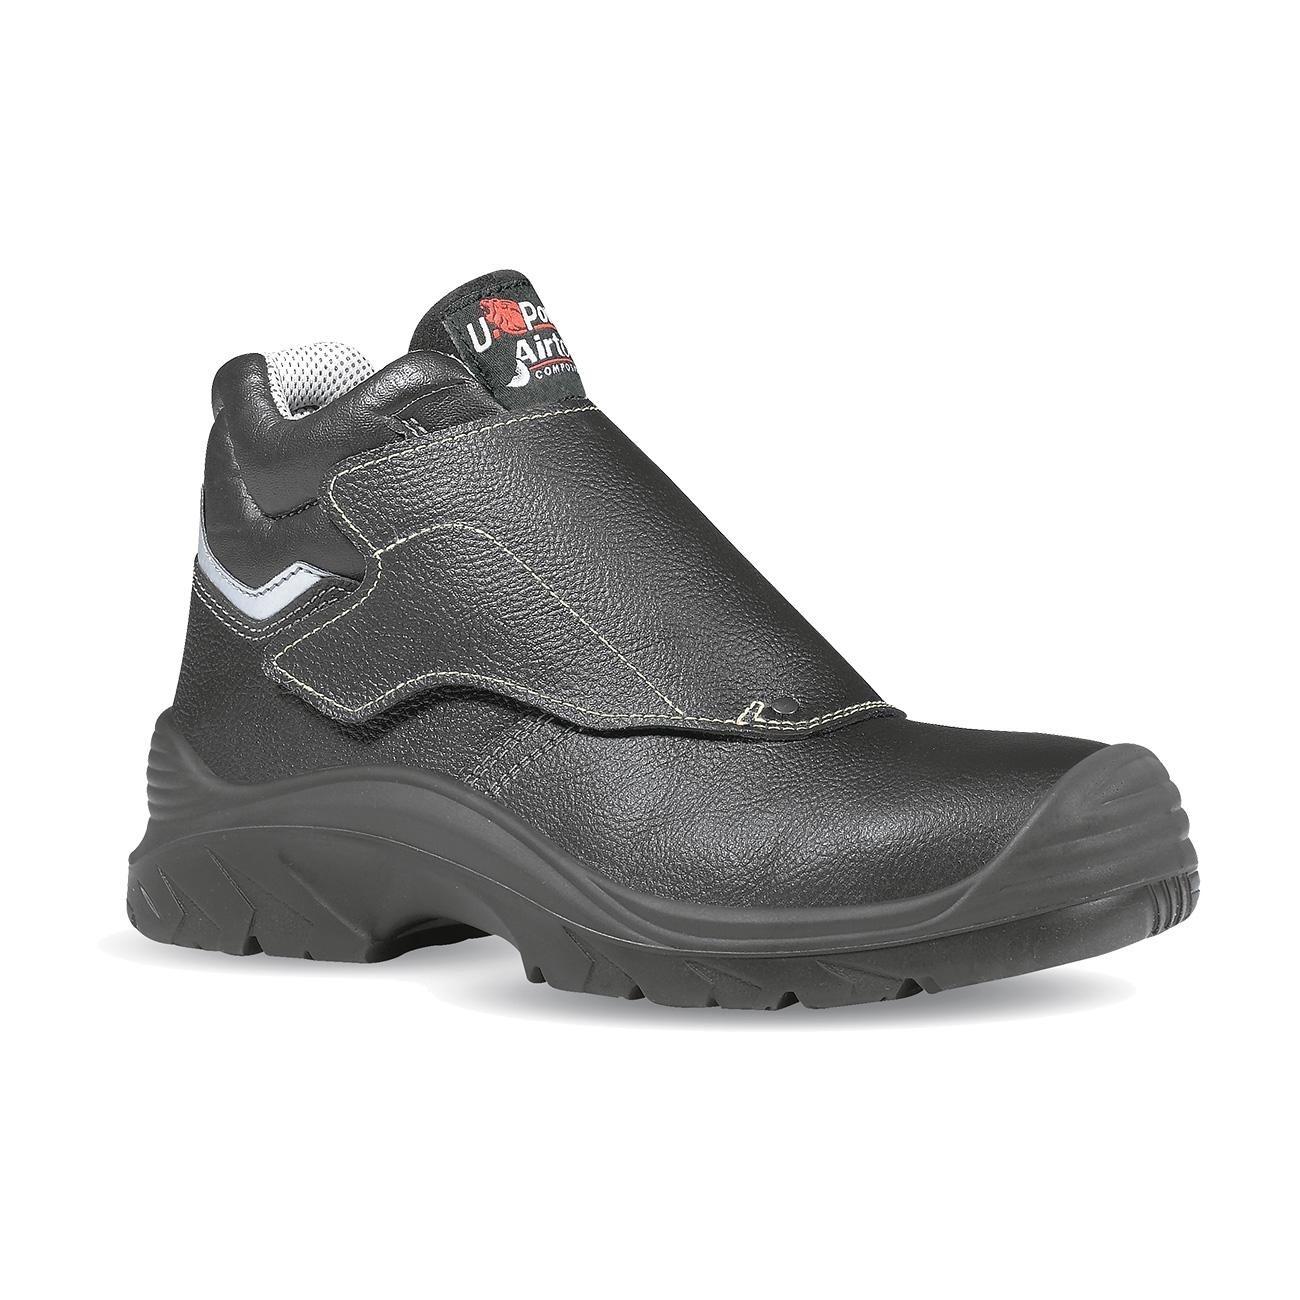 Zapatos de seguridad U Power Bulls S3 HRO HI WG SRC